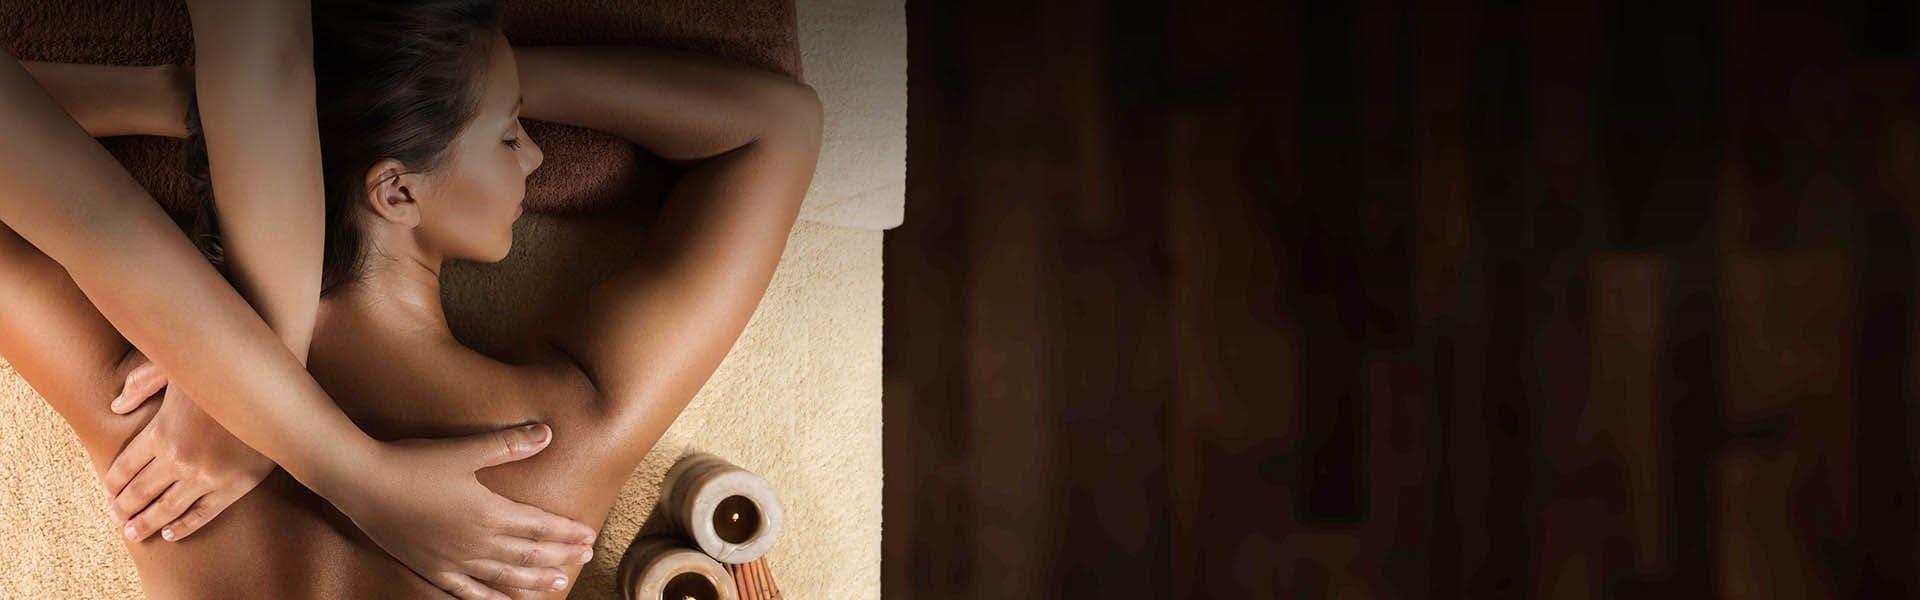 Erotic massage parlours in catania excited too